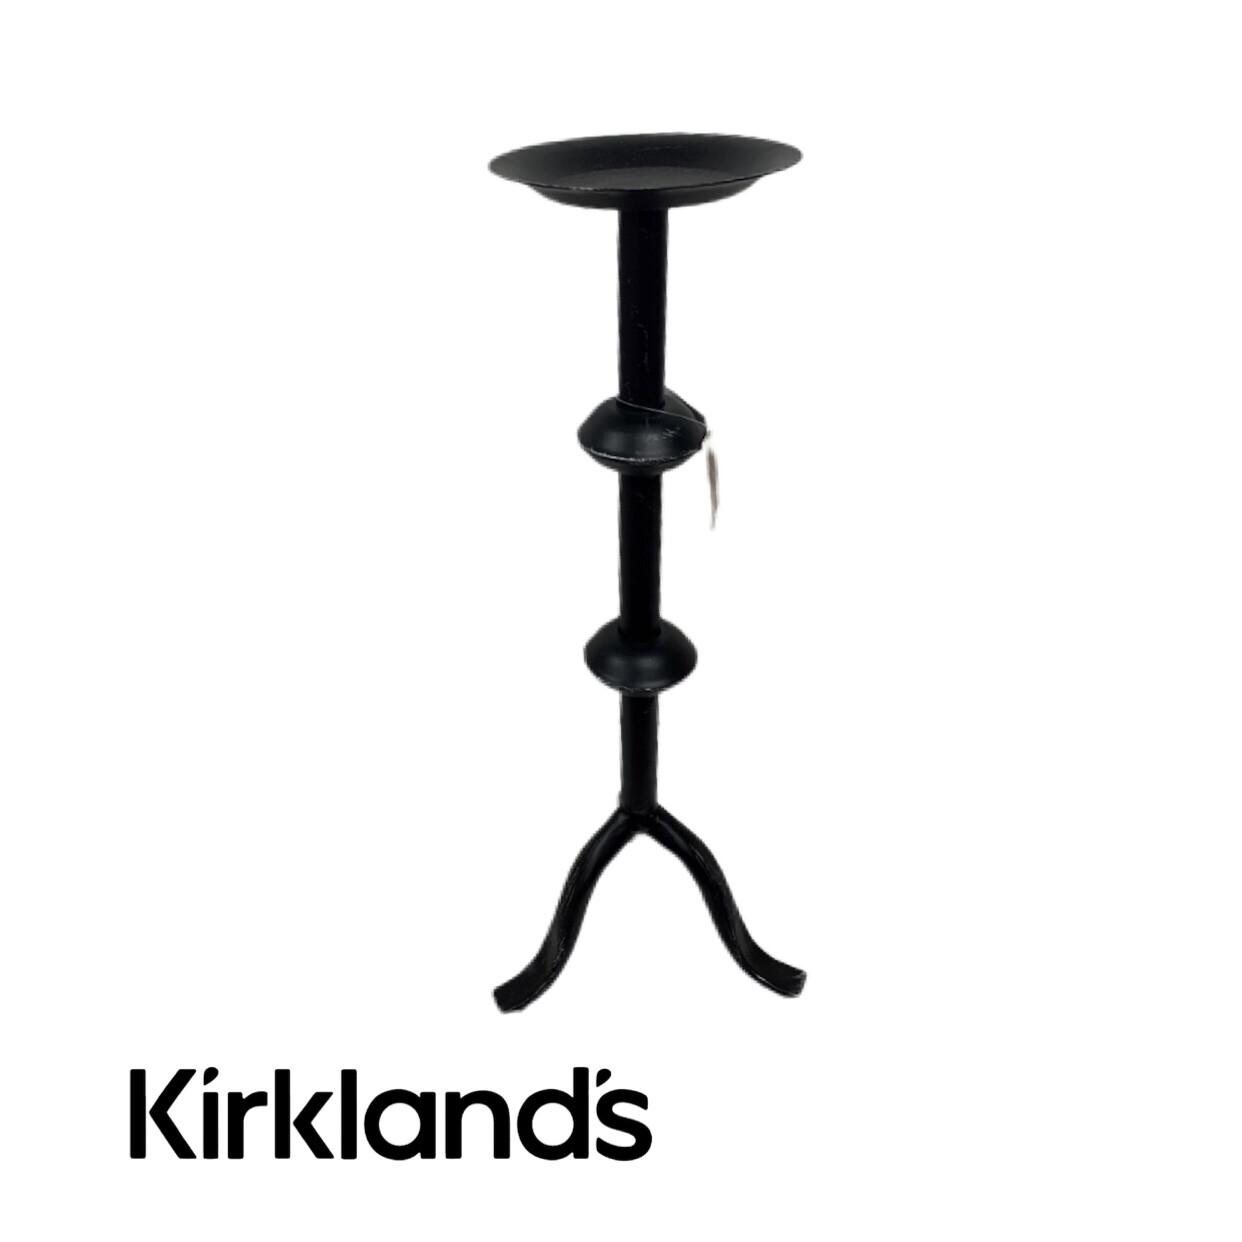 Kirklands Distressed Candle Holder Pillar